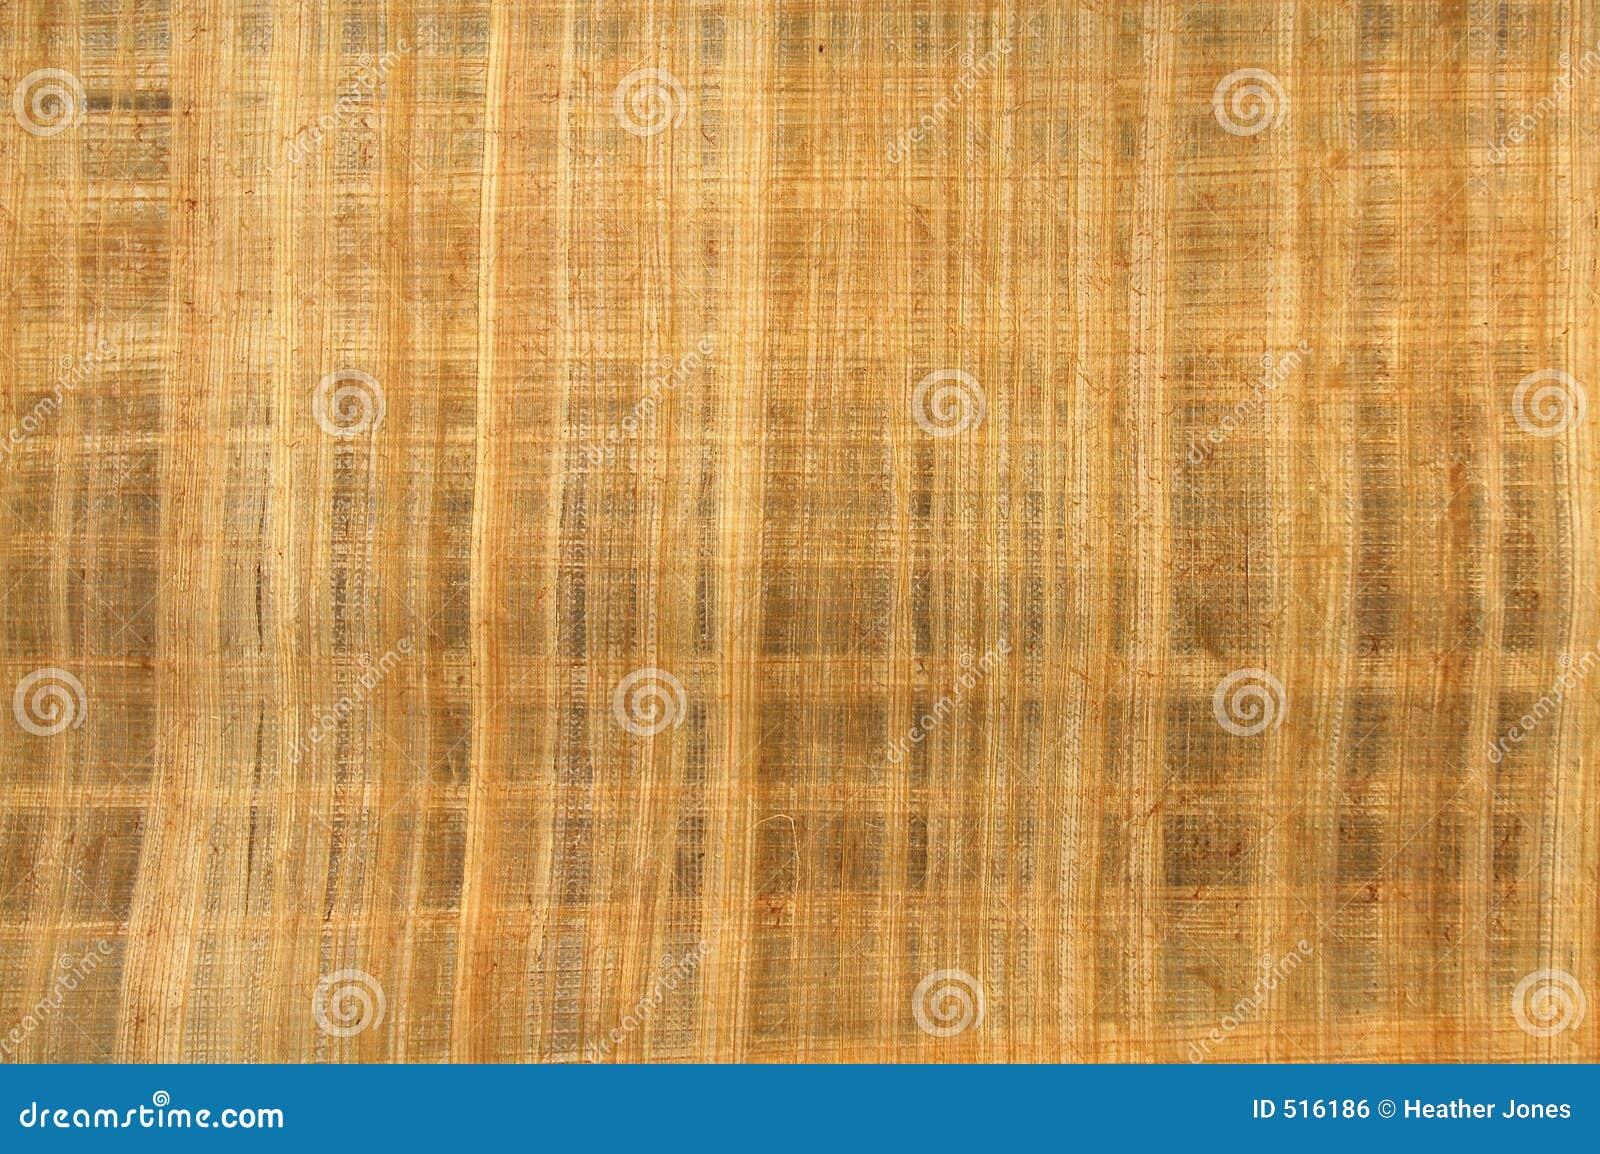 8 papper mönstrat trä